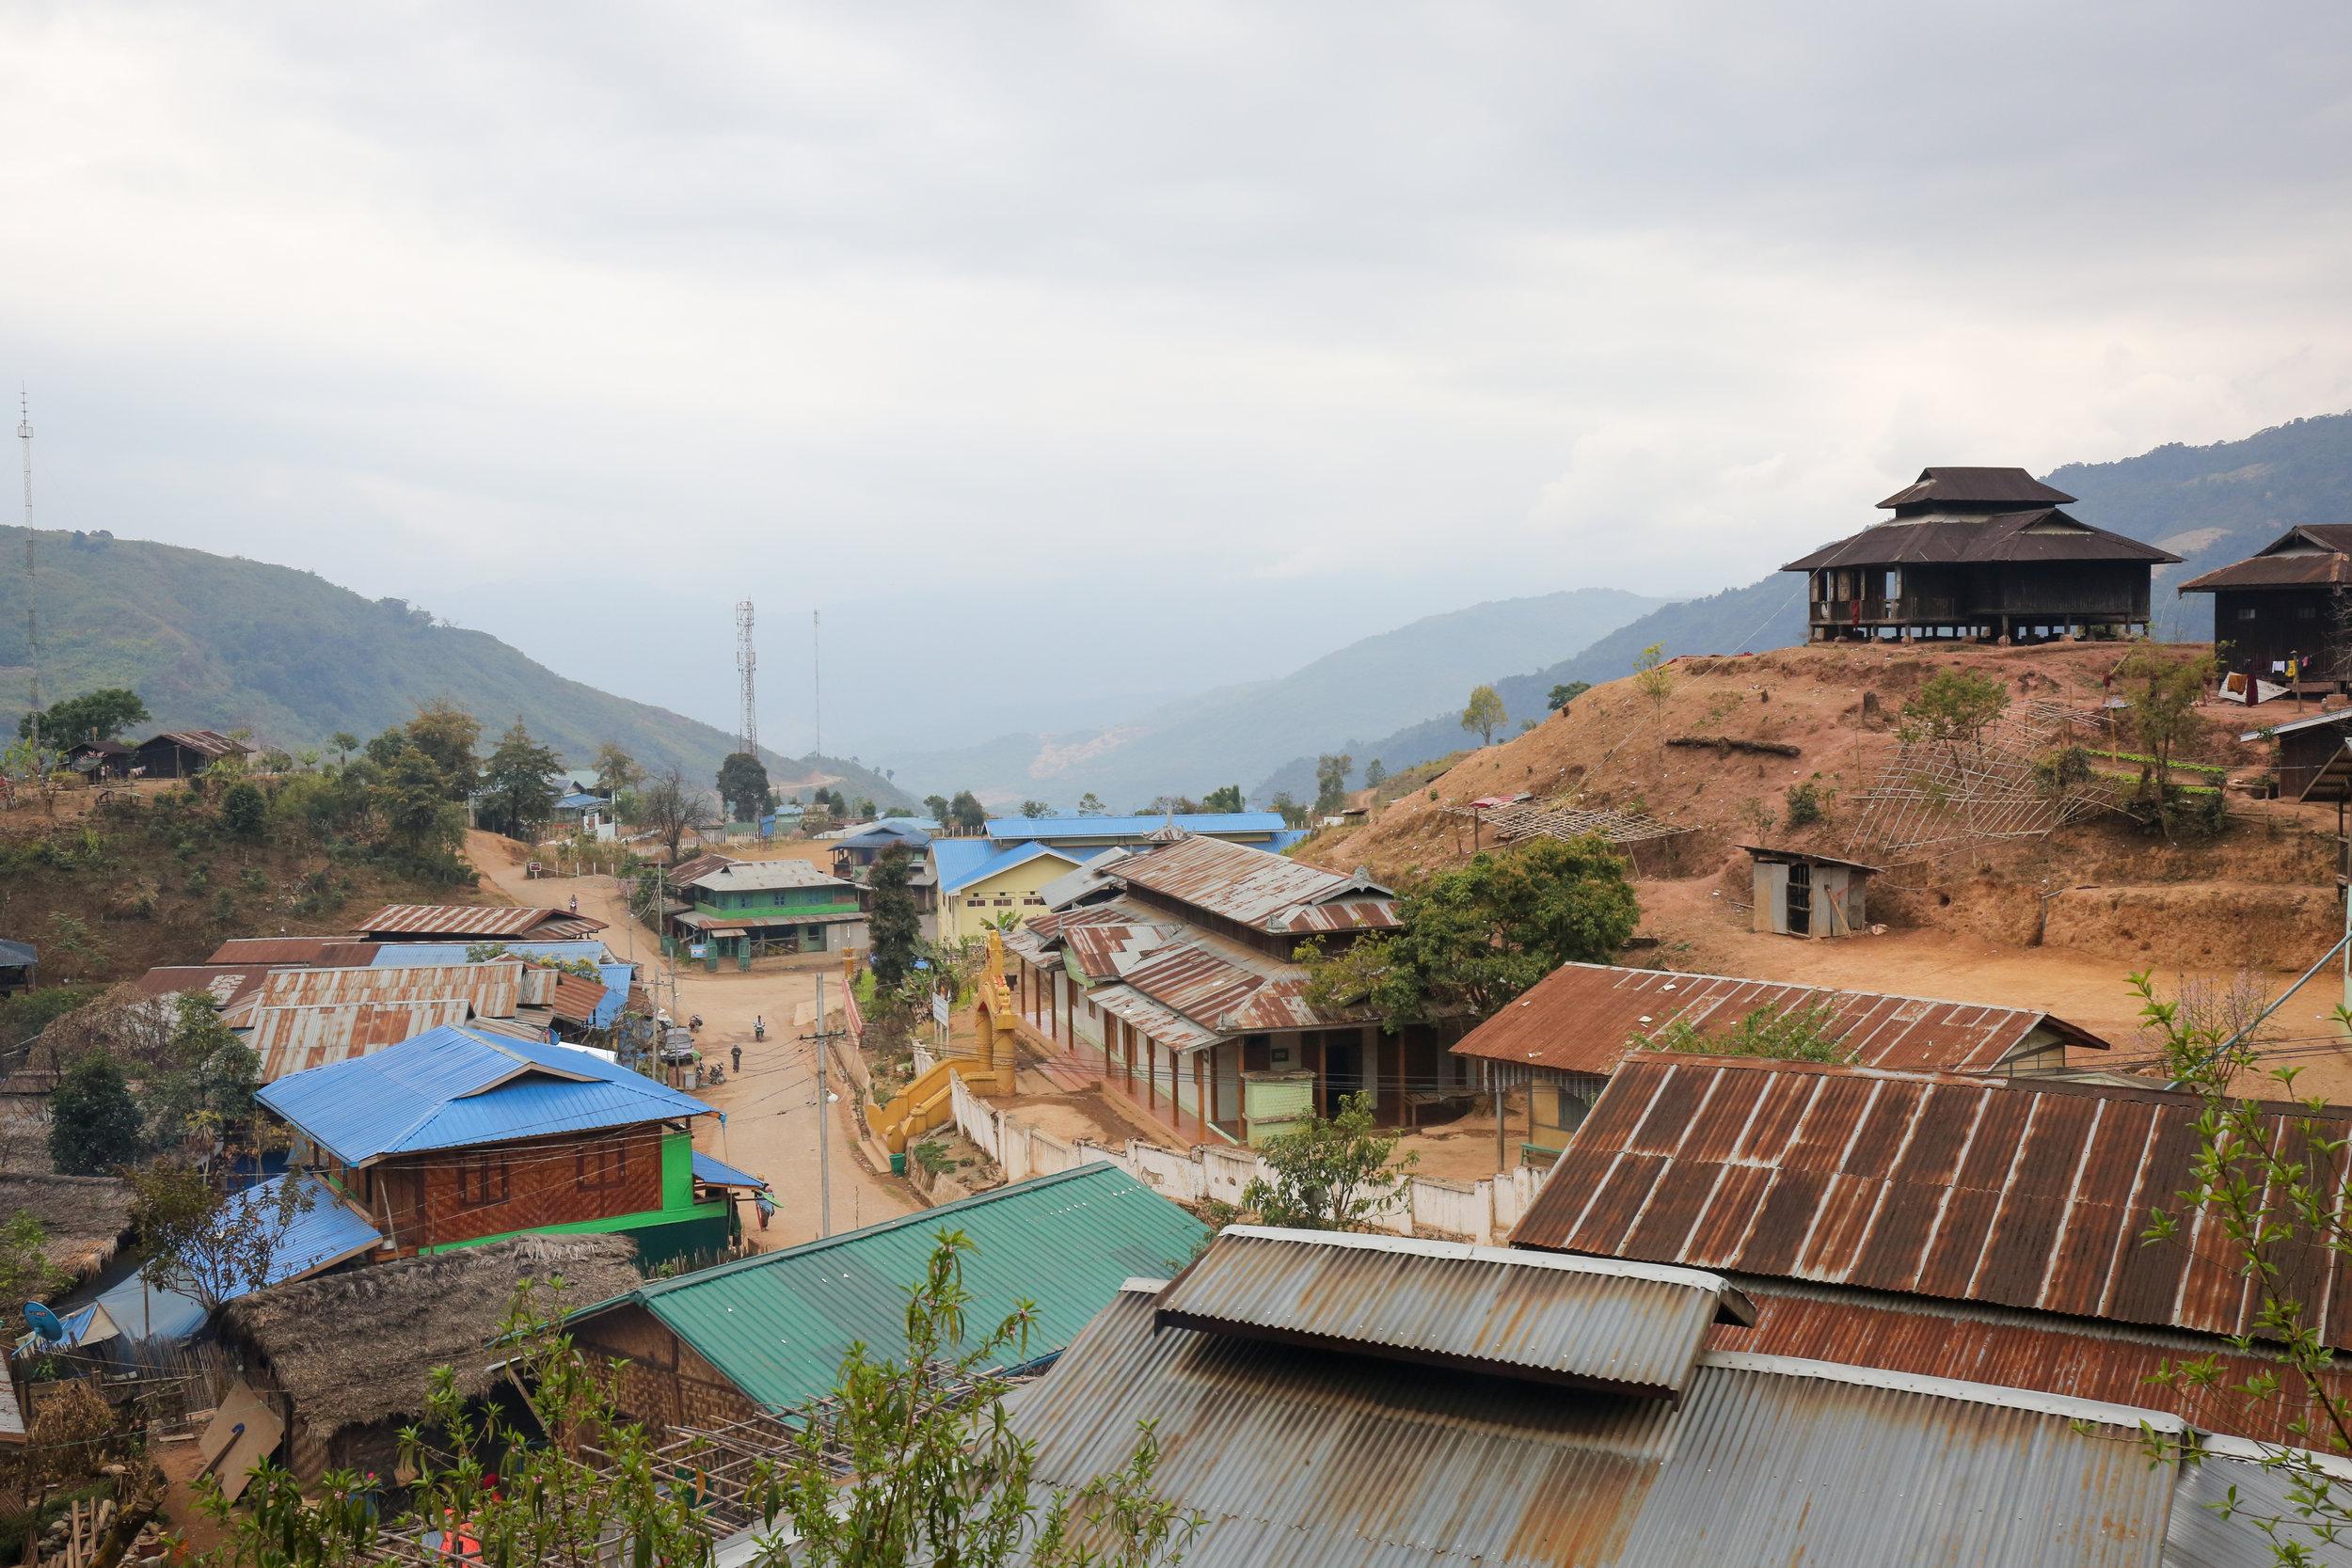 Lahe Township, the capital of the Naga Self-Administered Zone. Nagaland, Myanmar